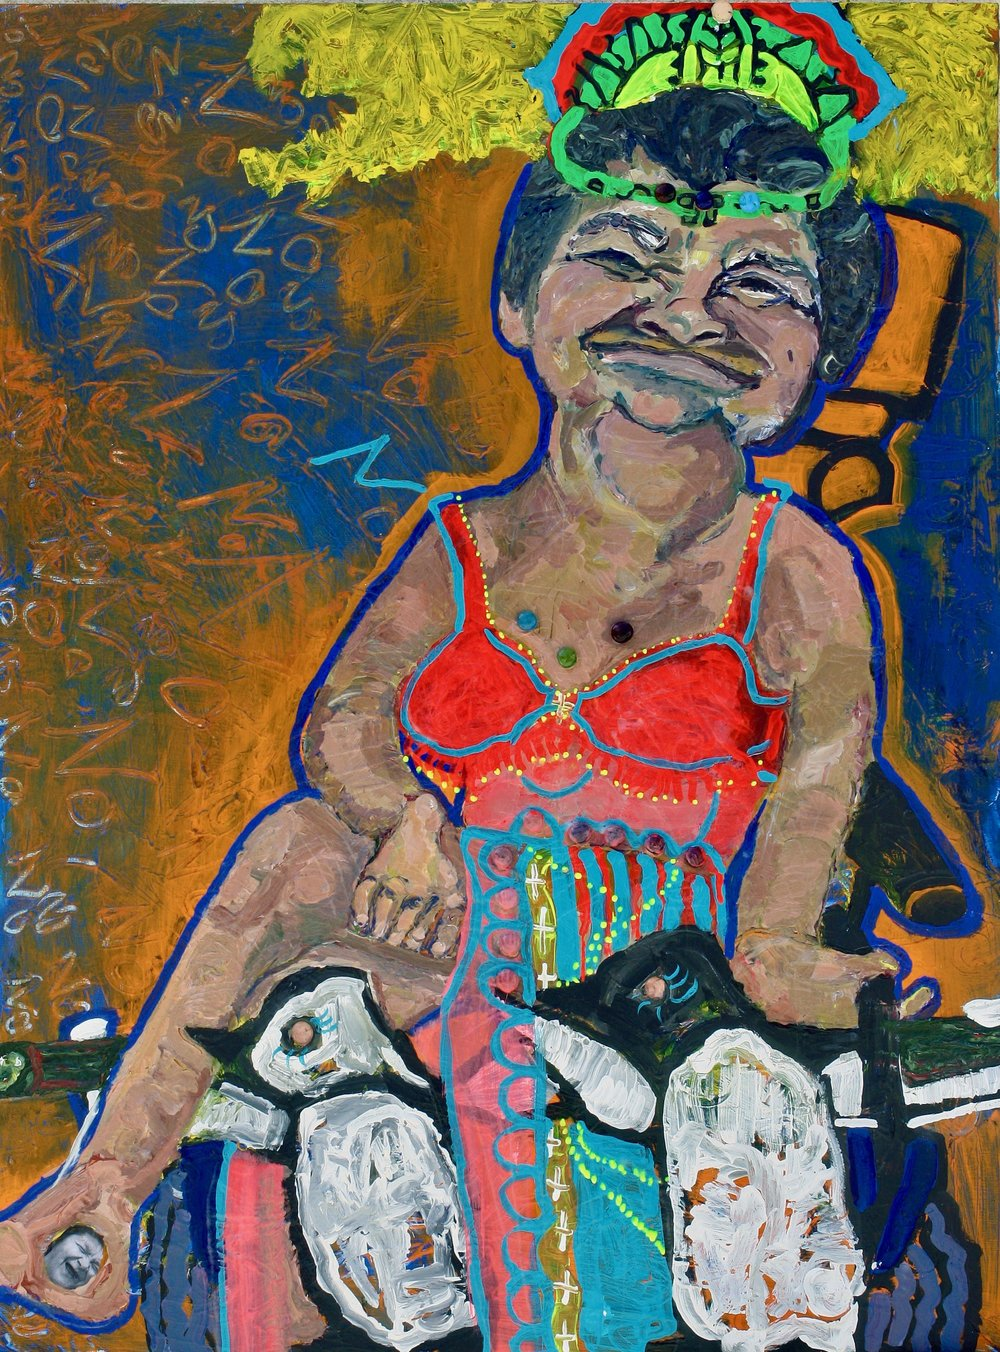 Queen Pleytez, acrylic on panel, 48x60 inches, 2013.jpeg